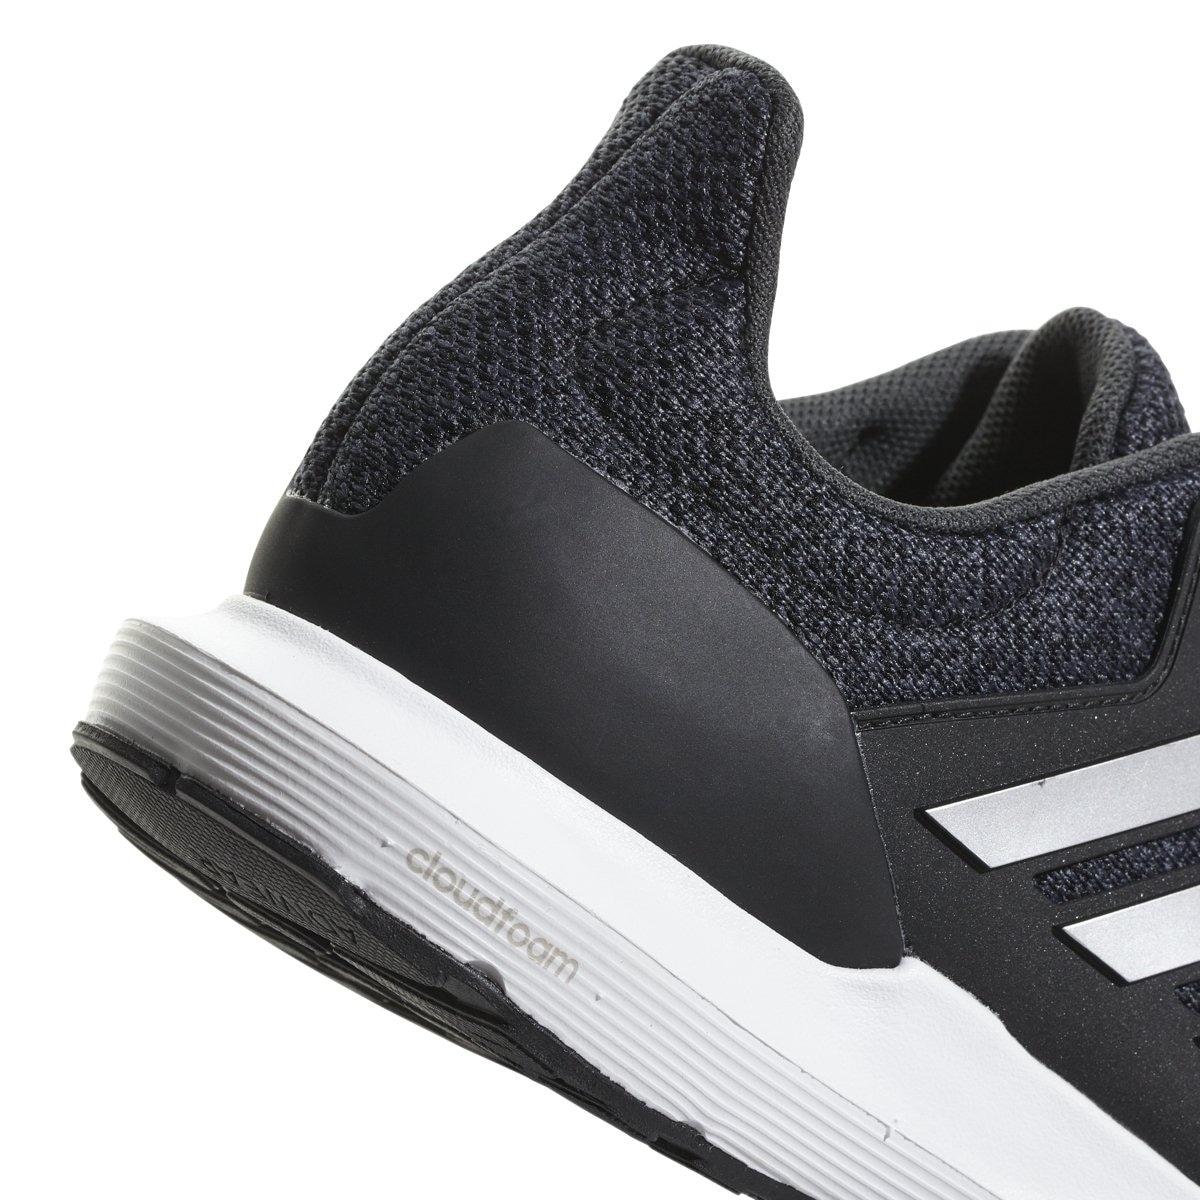 Adidas Women's Solyx Running Shoe